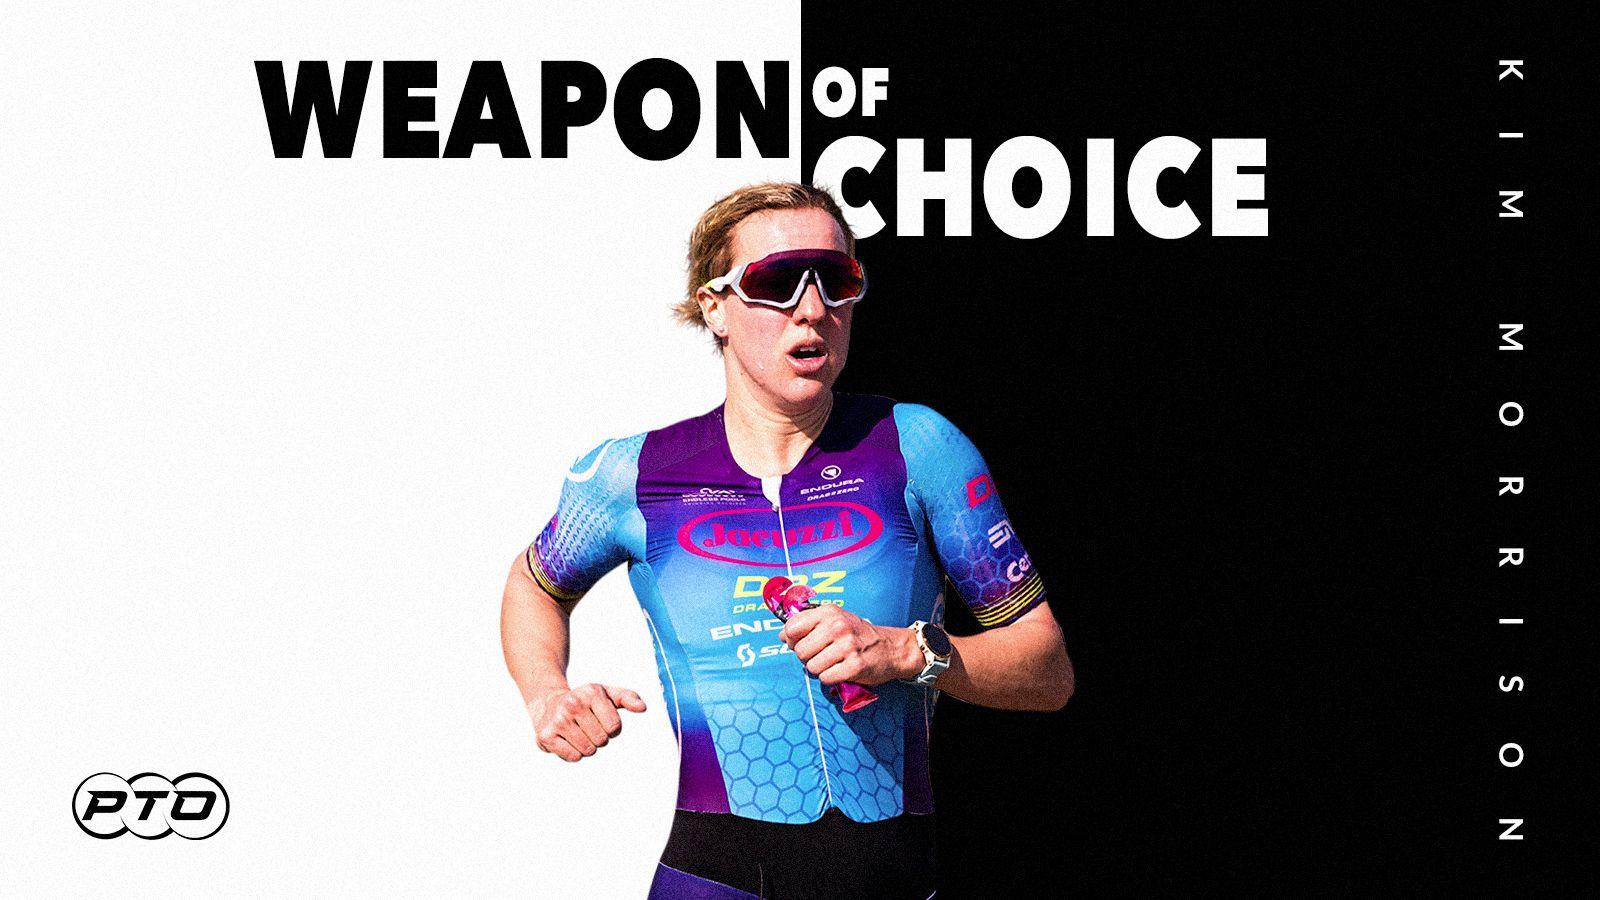 Weapon of Choice || Kimberley Morrison